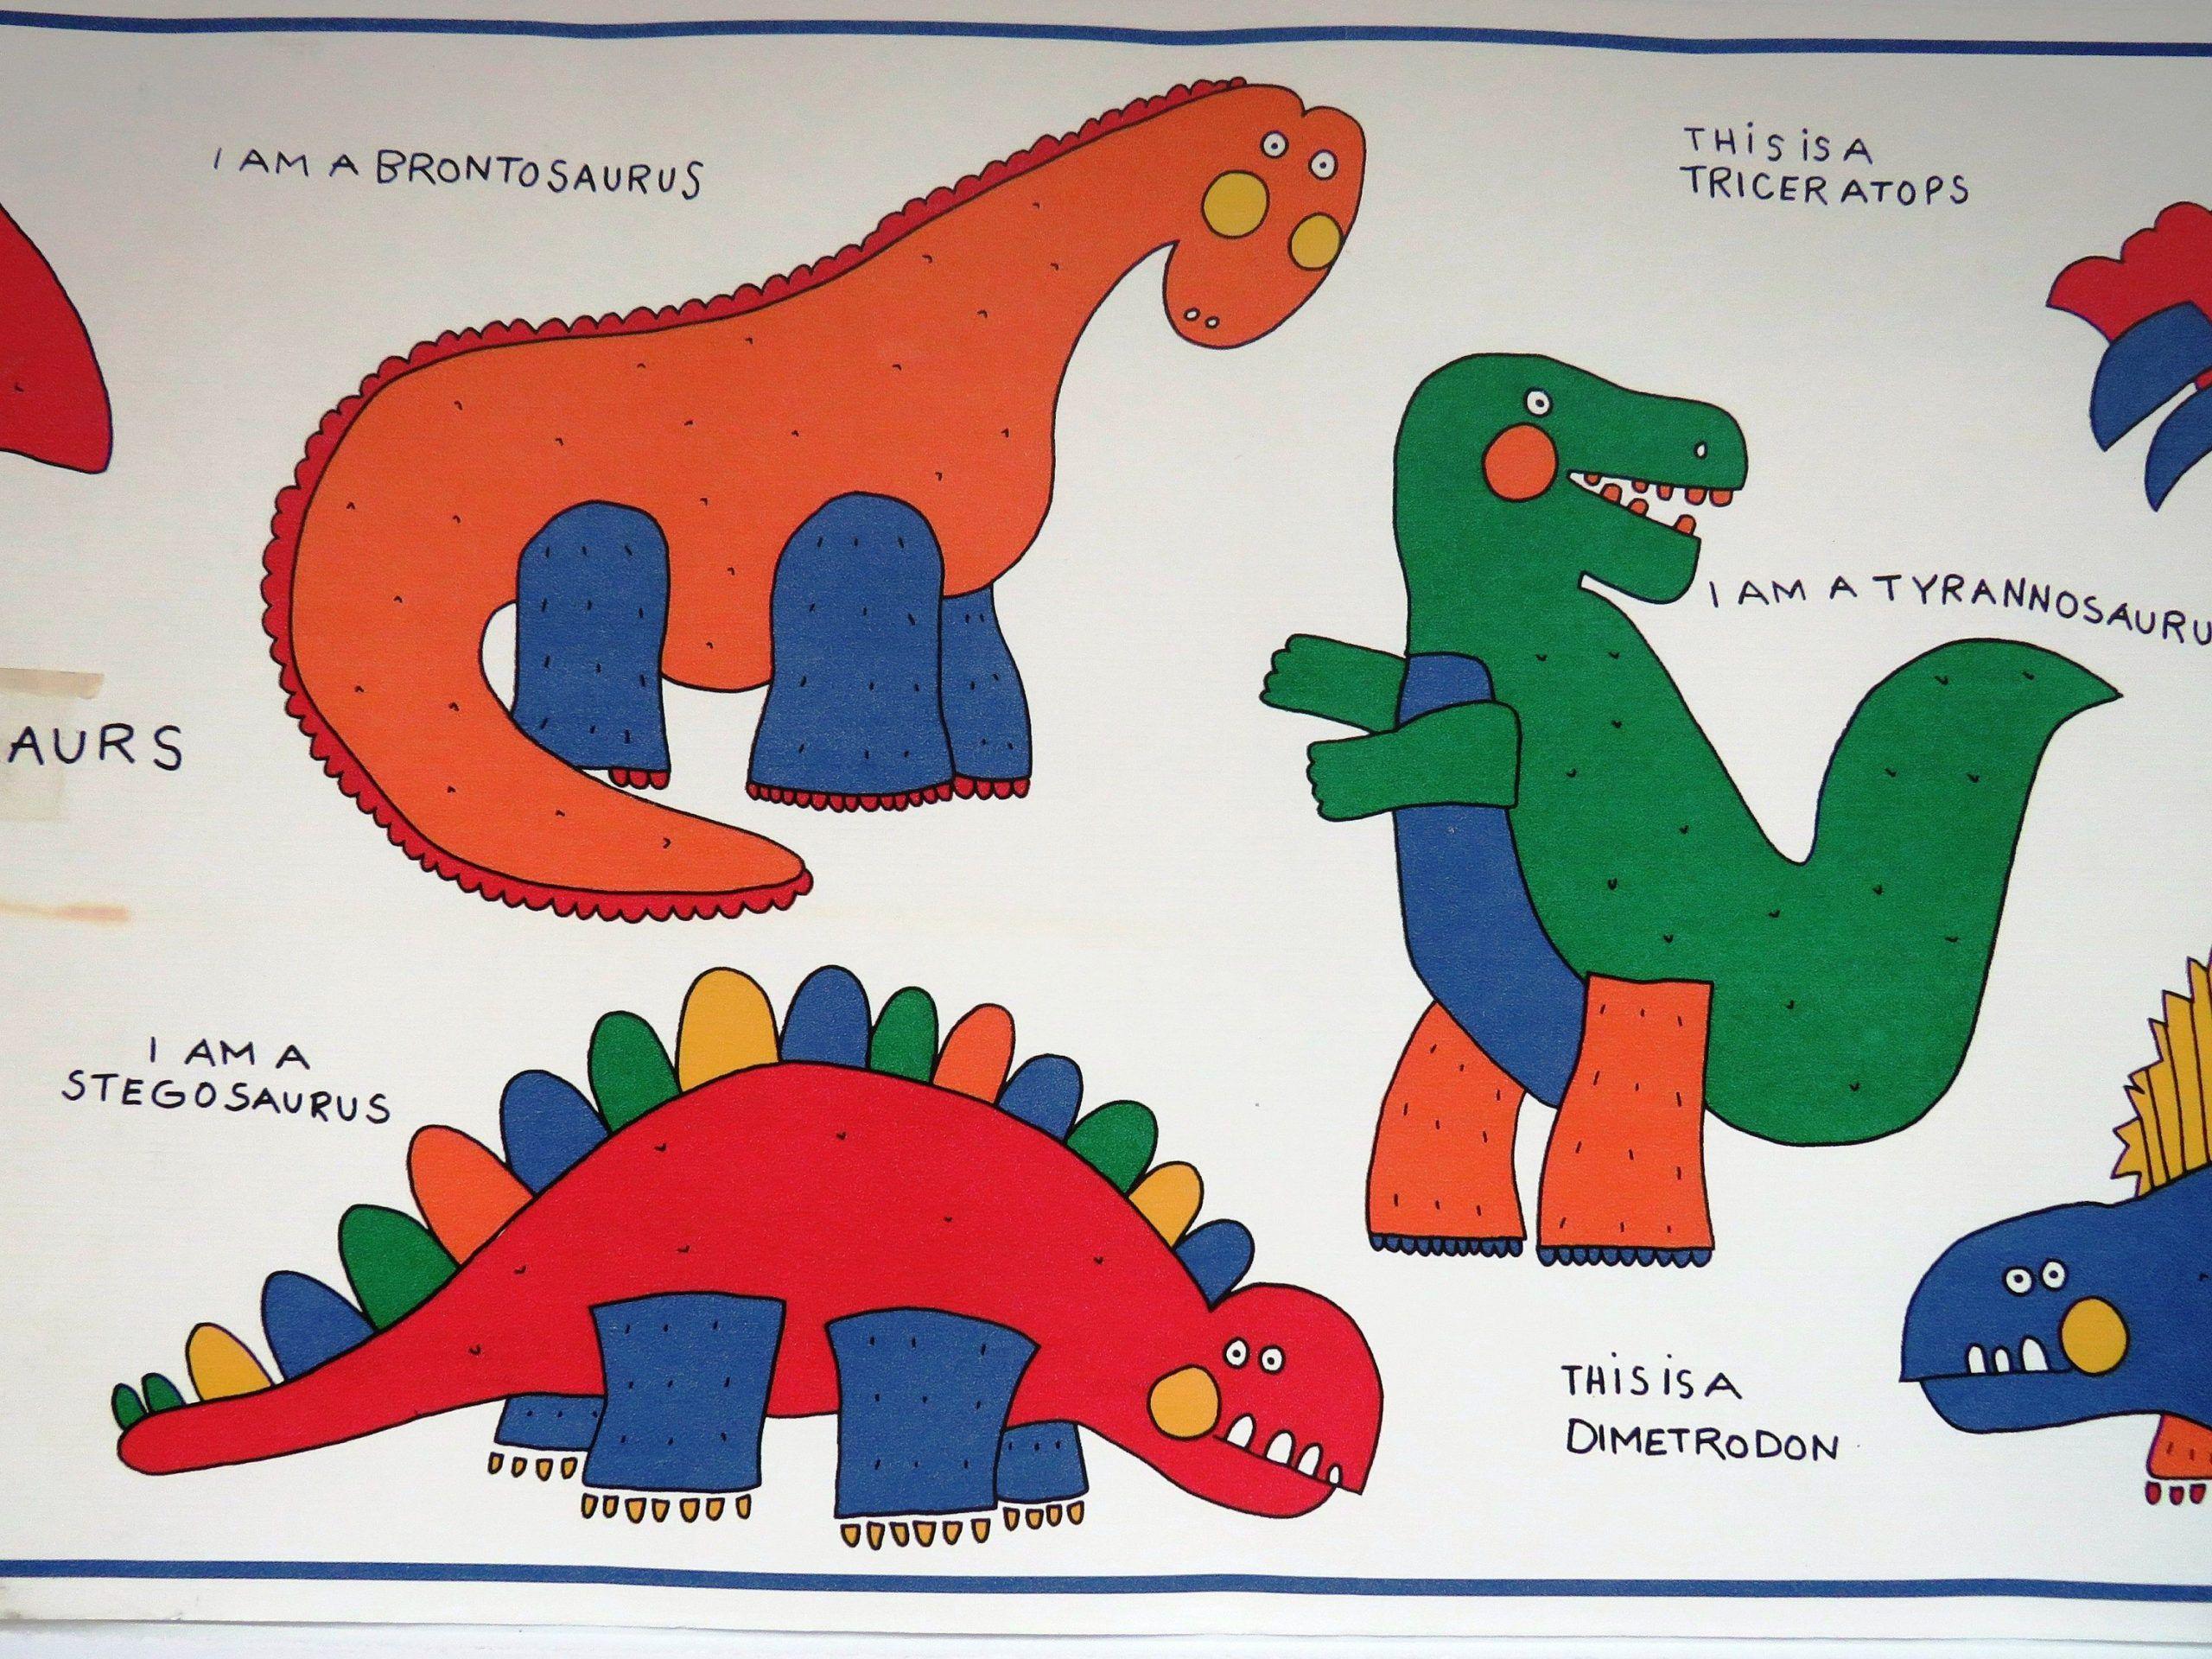 Childrens Dinosaur Wallpaper Border 15 Ft By 10 Inches Colorful Dinosaur Names Boys Girls Bedroom In 2020 Dinosaur Wallpaper Playroom Art Dinosaur Wallpaper Border